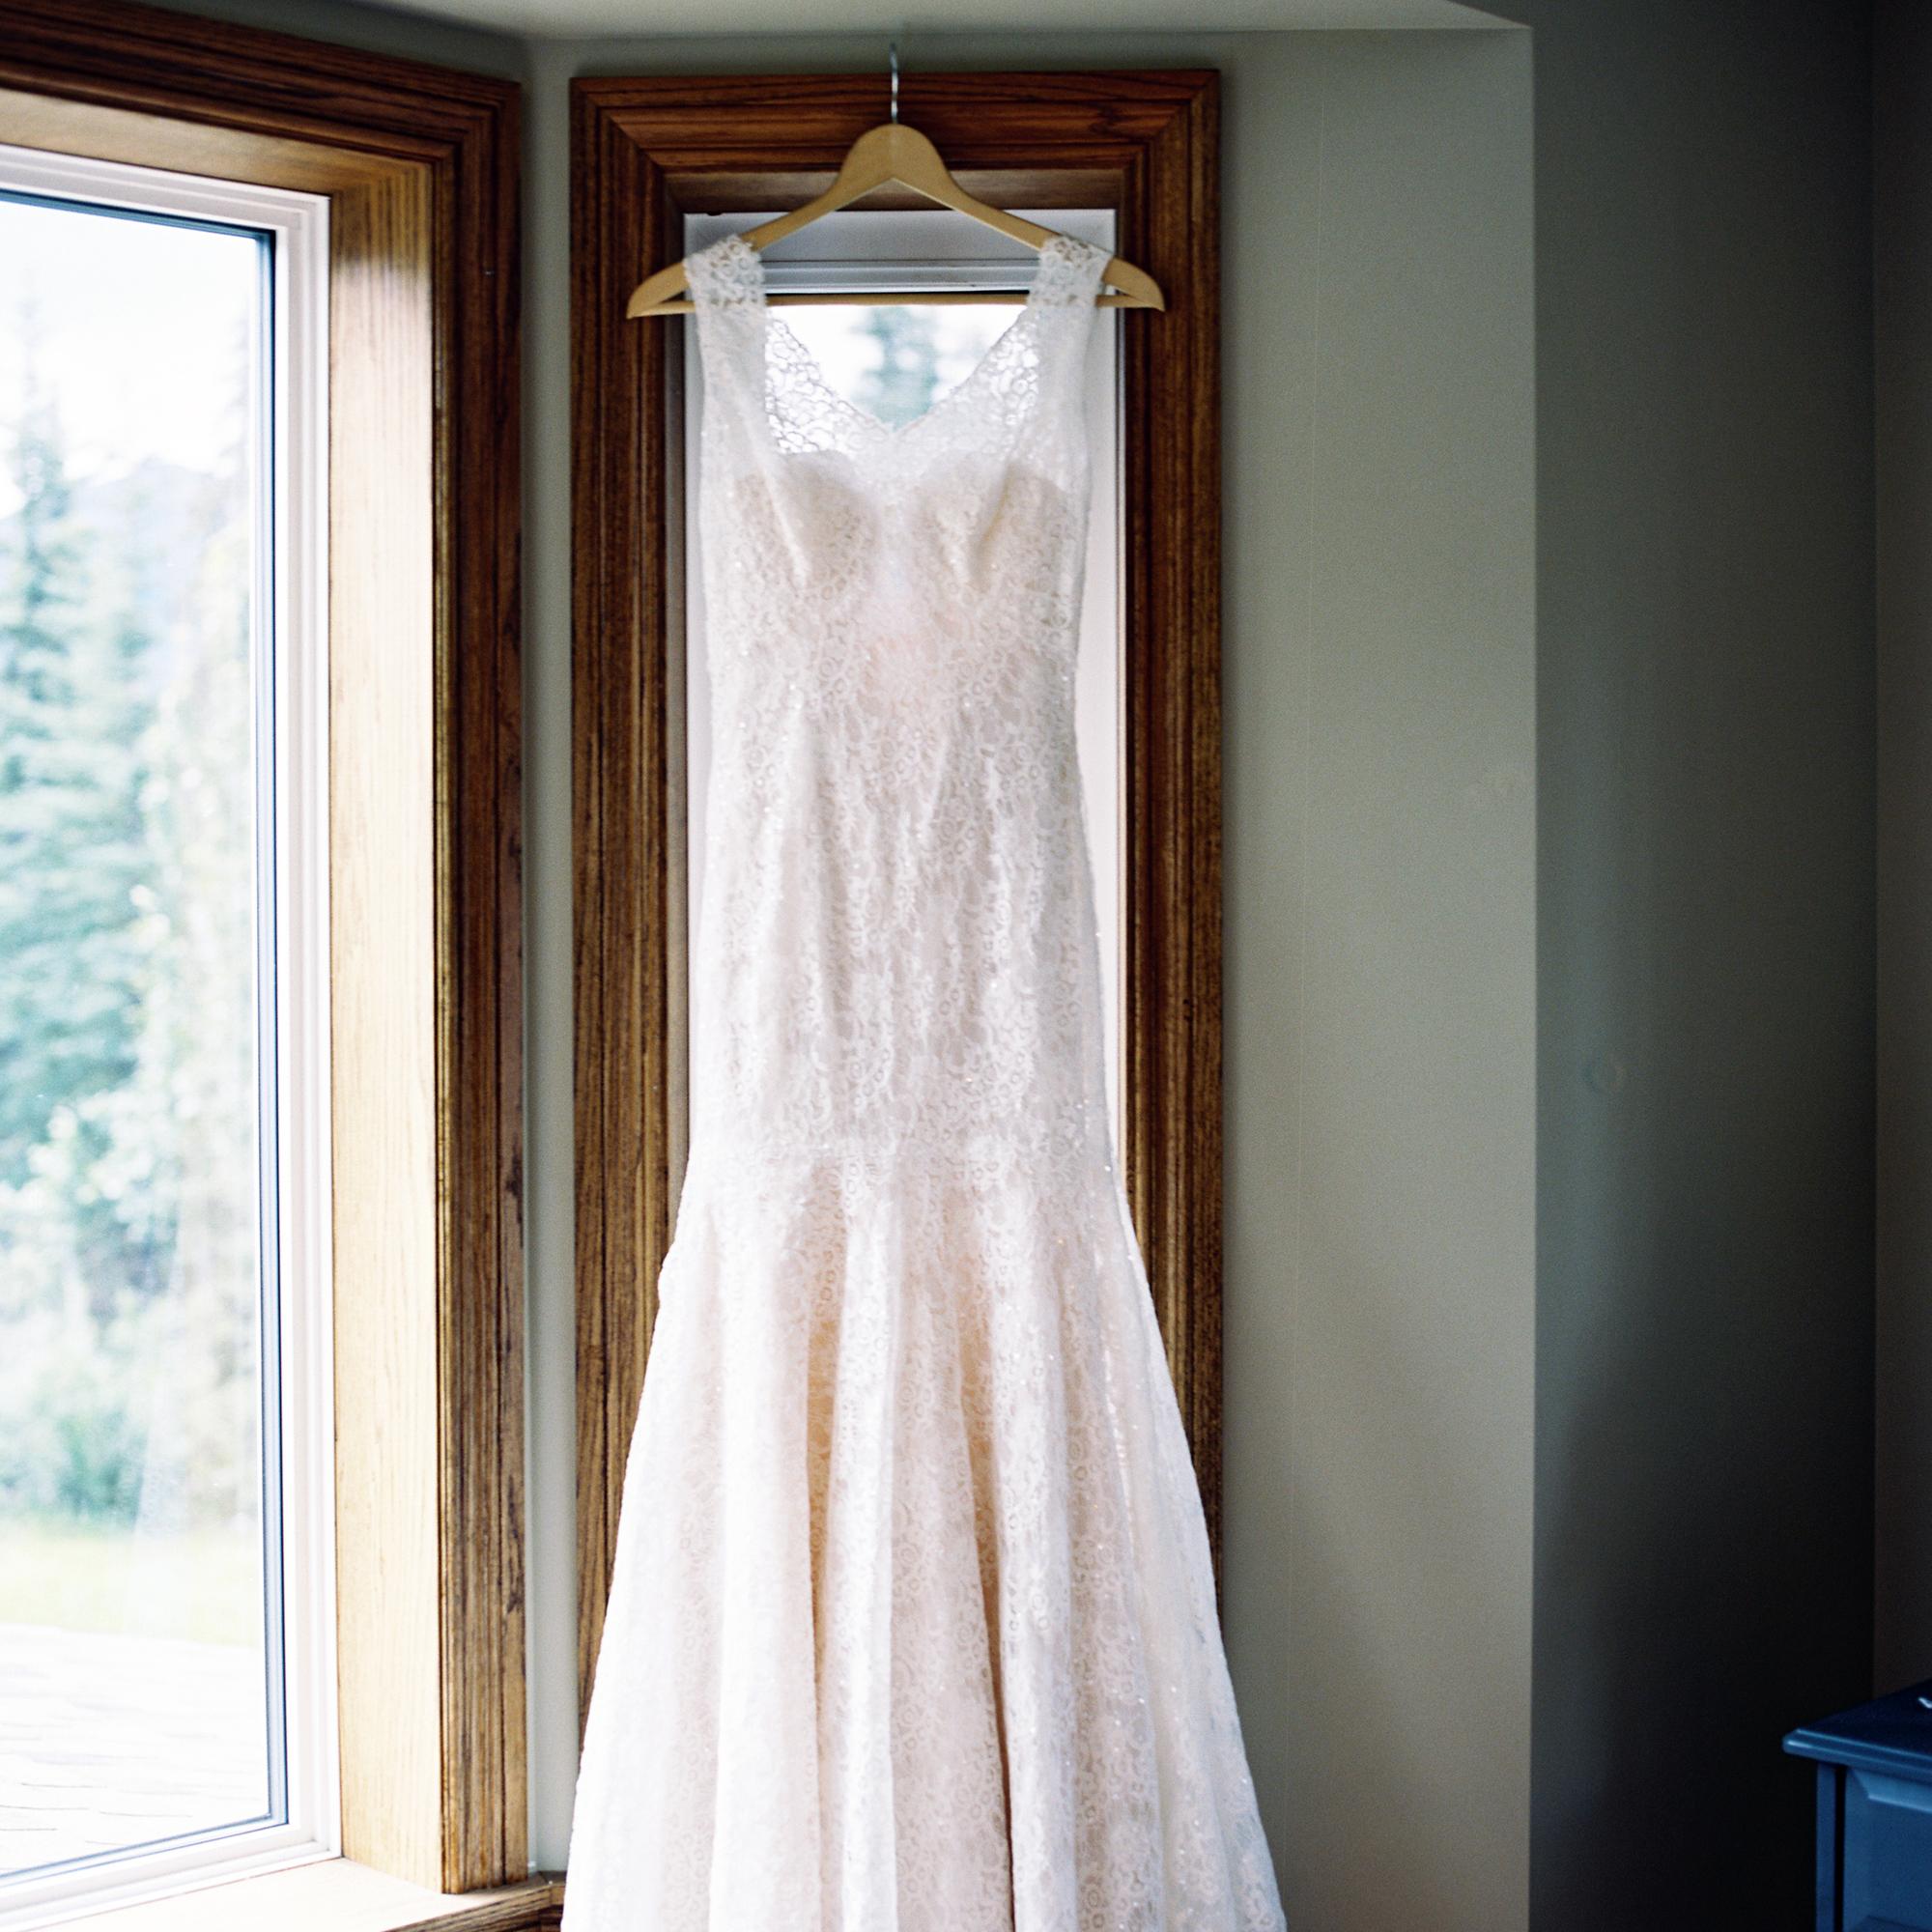 Wedding dress hanging in front of window